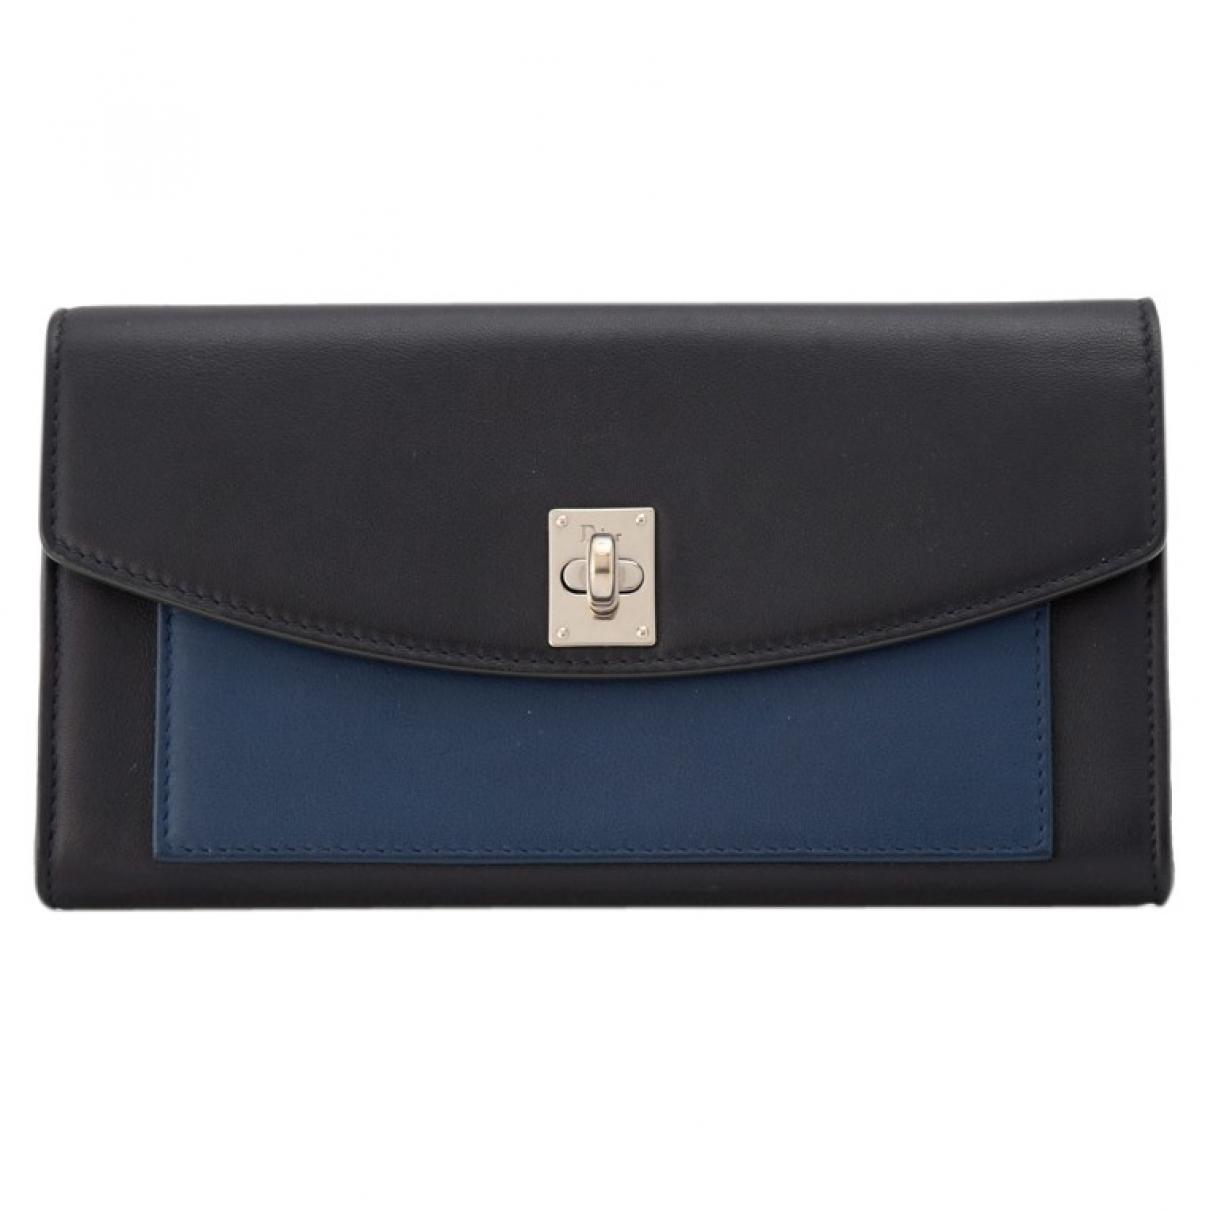 Dior \N Black Leather wallet for Women \N